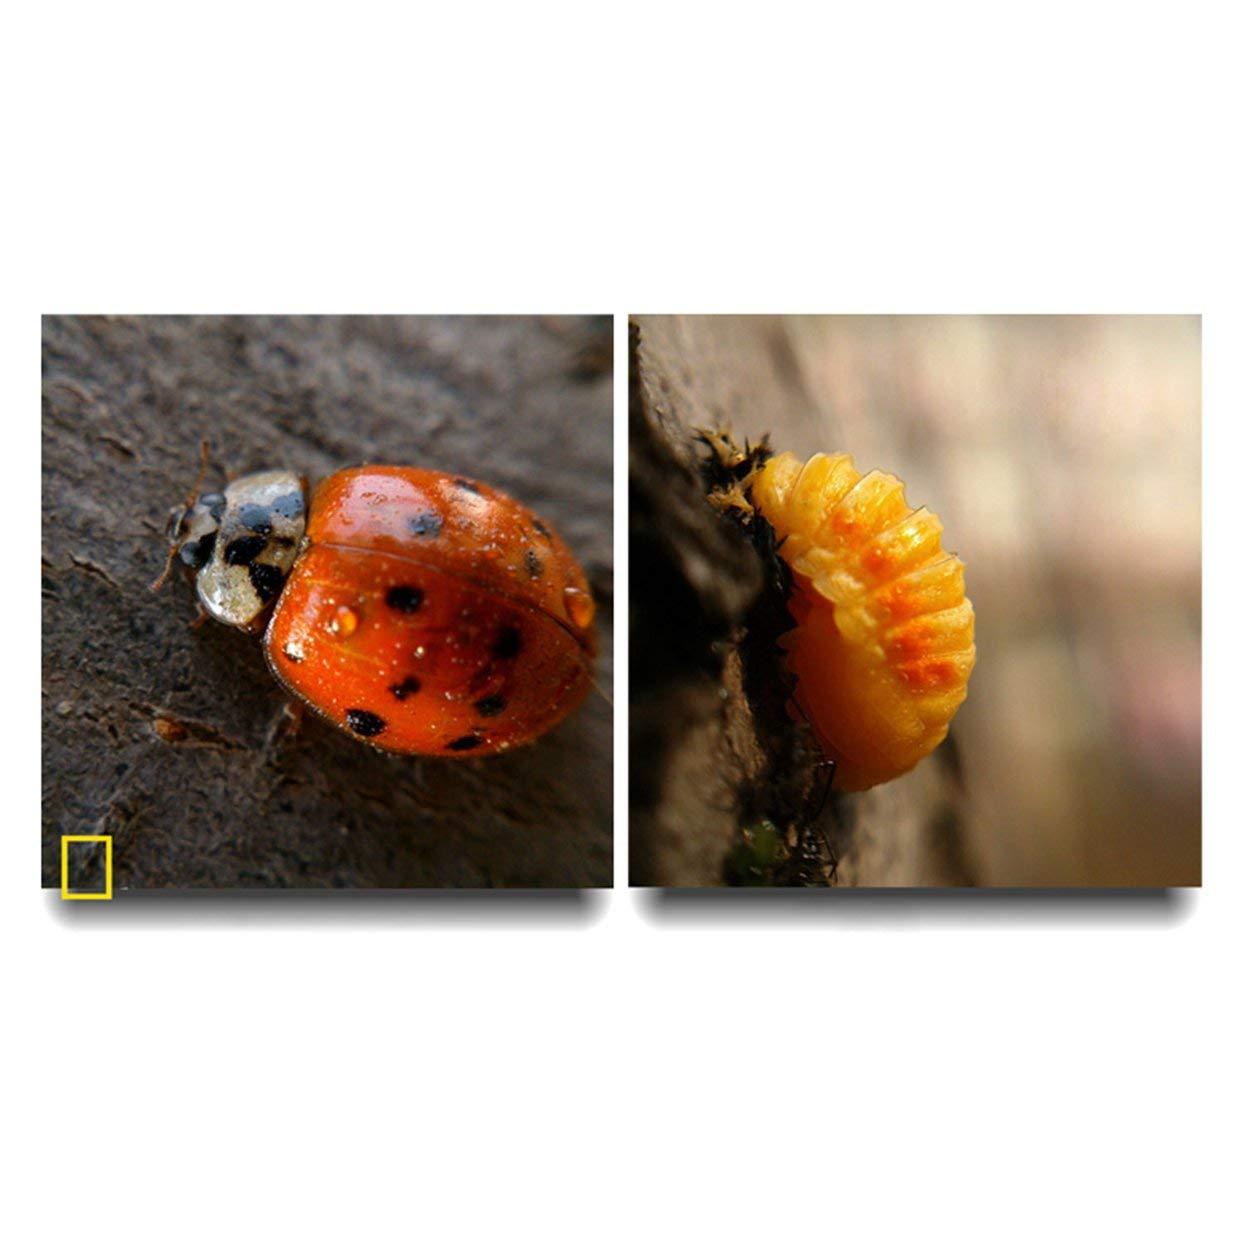 Lente Gran Angular Transformar tel/éfono en c/ámara Profesional Tree-on-Life Kit de Lentes de tel/éfono Multifuncional 3 en 1 Lente de Peces Lente de Macro